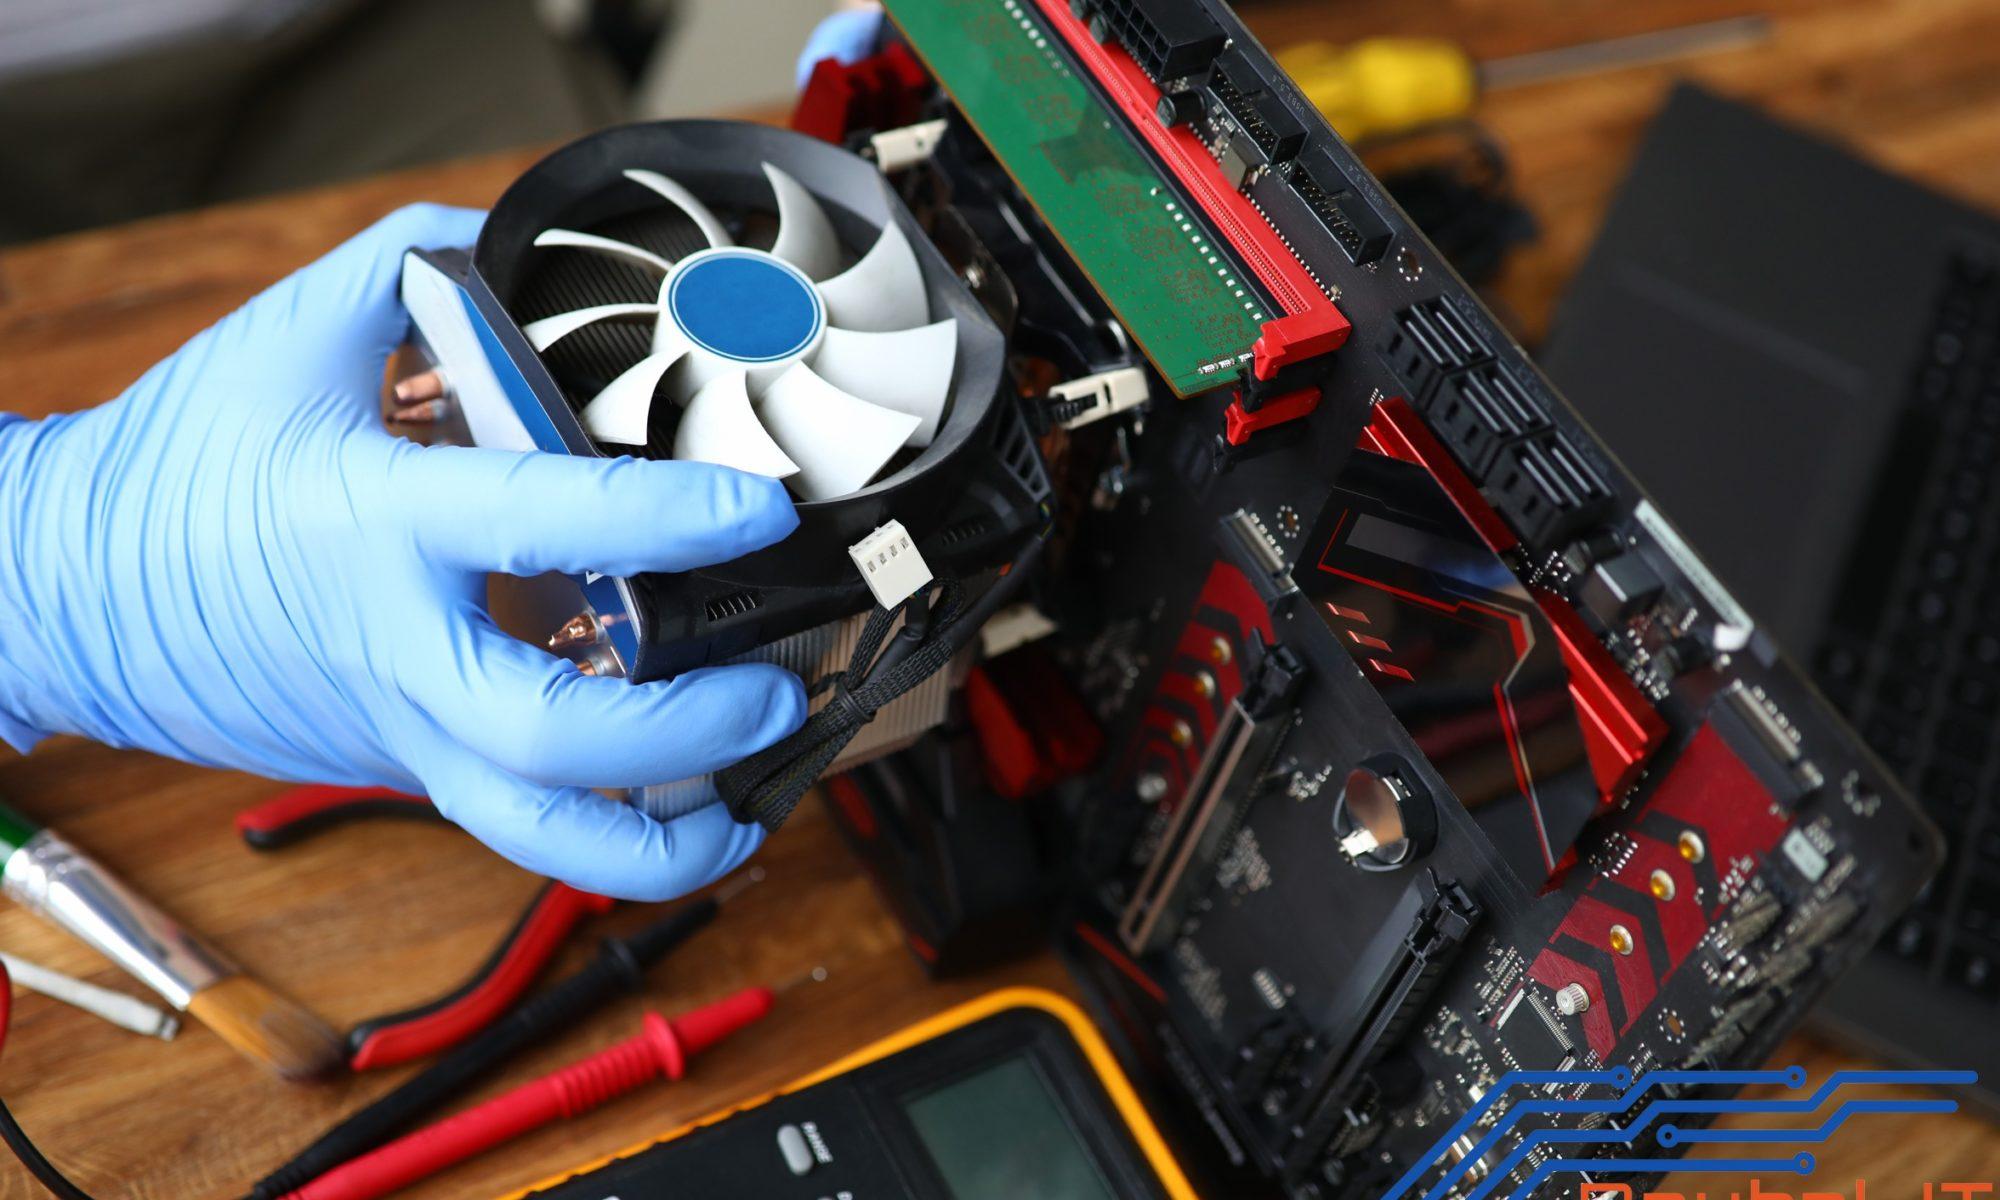 PC und Server Reparatur und Upgrade